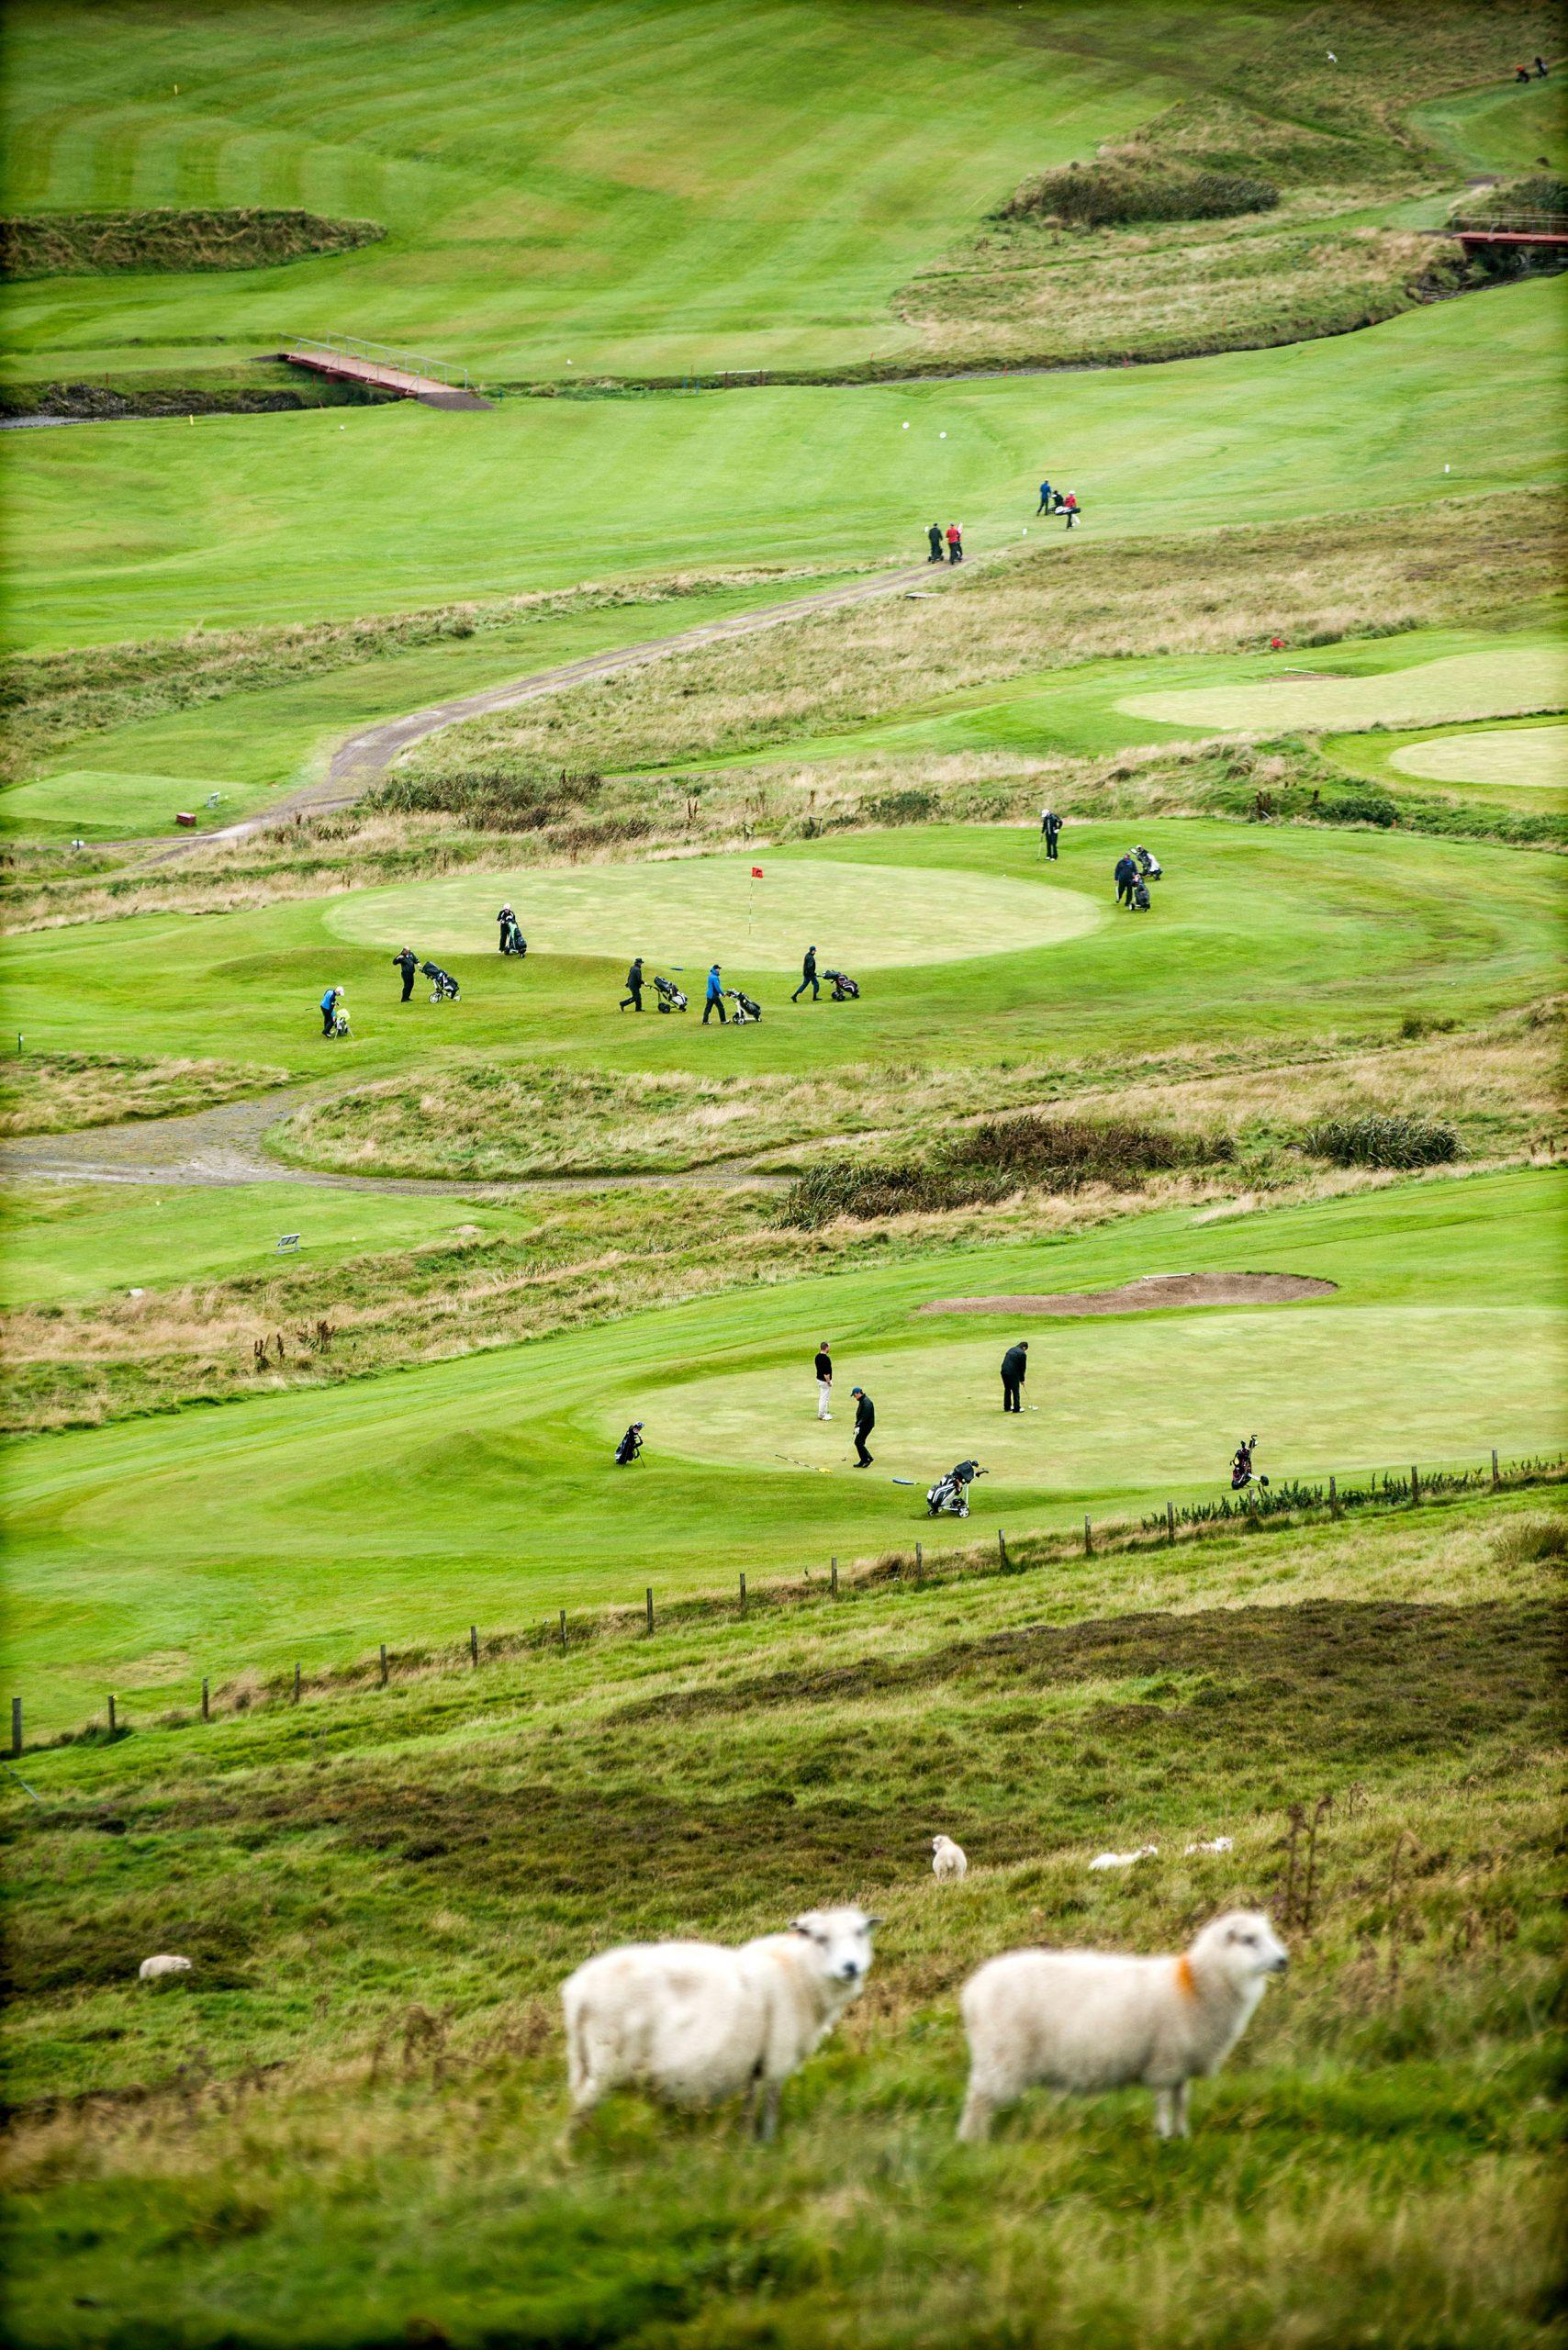 Sheep graze near the Shetland Golf Club in Burn of Dale, a few miles west from Lerwick capital of Shetland. Photo by Xavier Cervera/Panos.